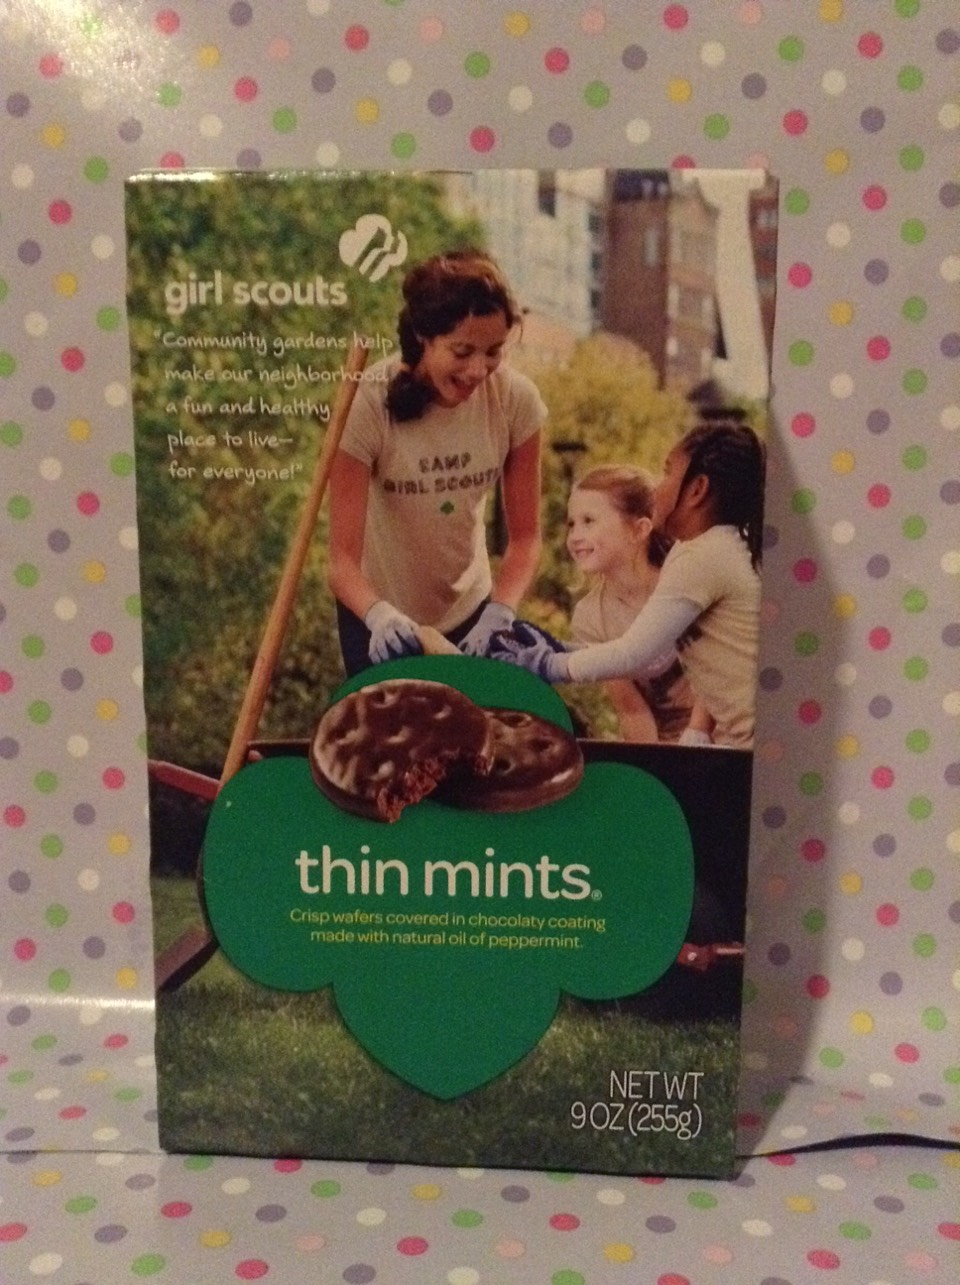 THIN MINTS: 1.put them in fridge/freezer 2. Crumble them over ice cream